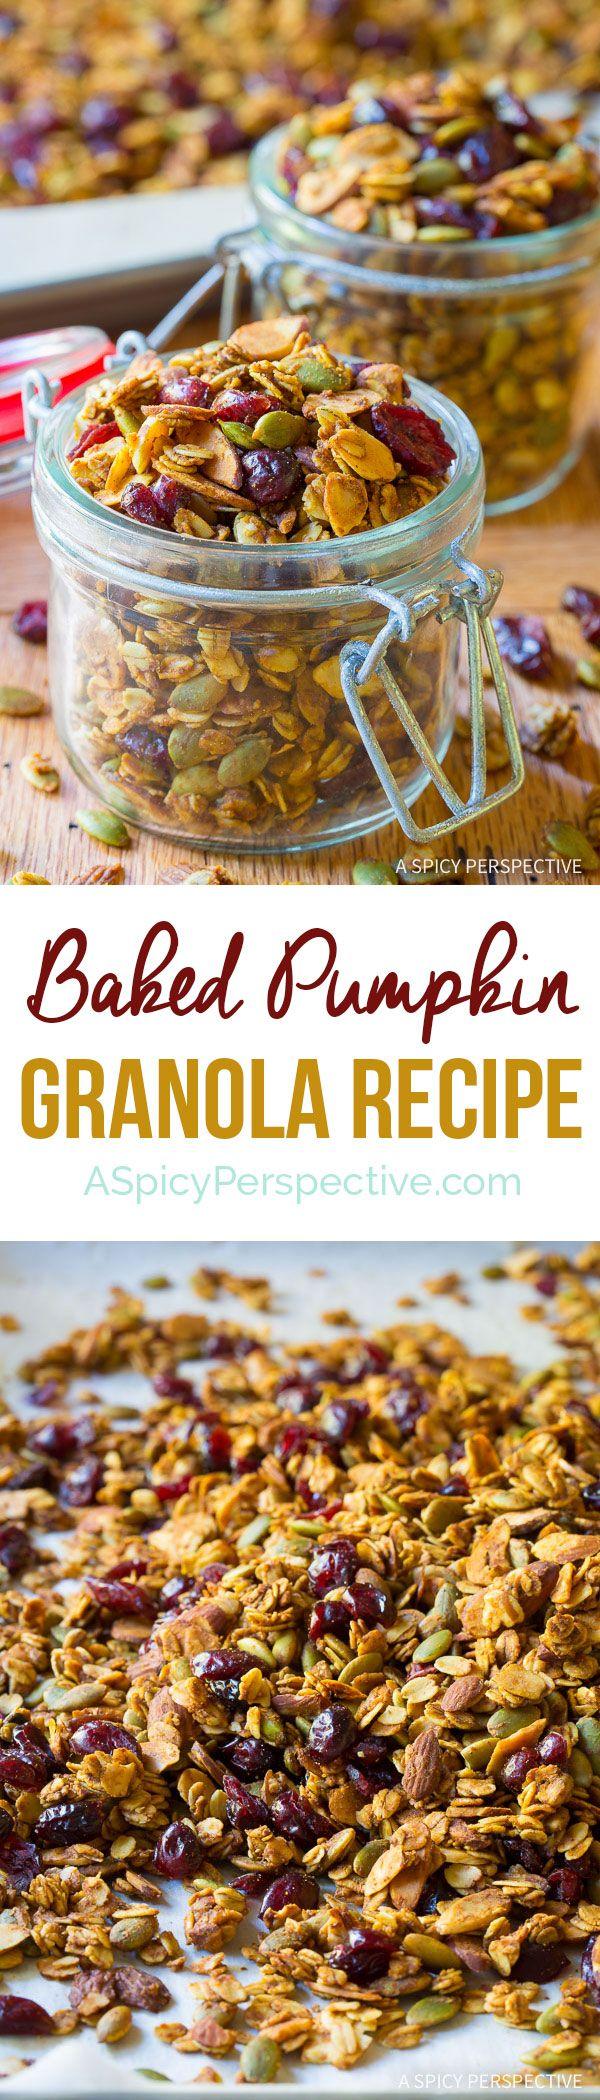 Tastes Like Fall! Baked Pumpkin Granola Recipe on ASpicyPerspective.com